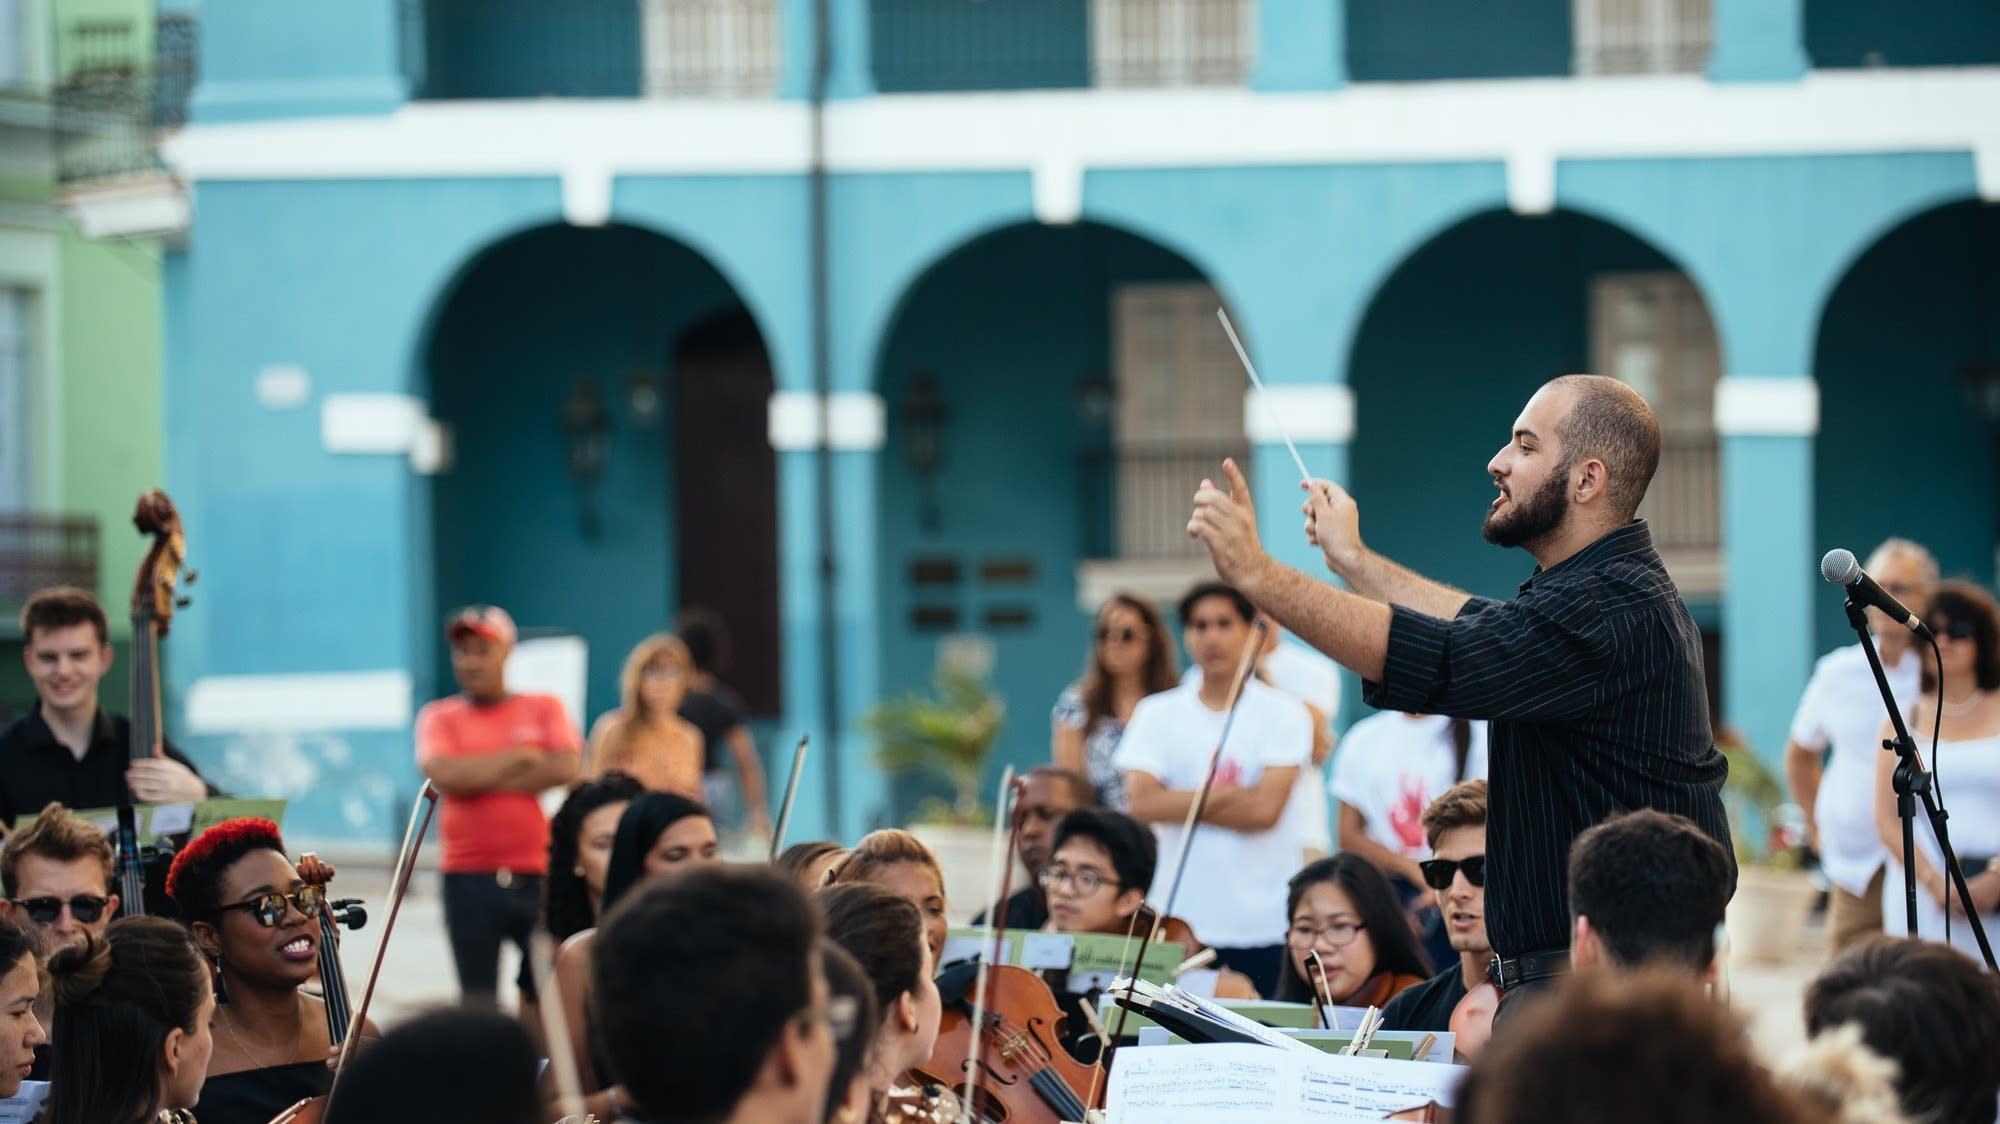 CAYO musicians perform in Matanzas, Cuba